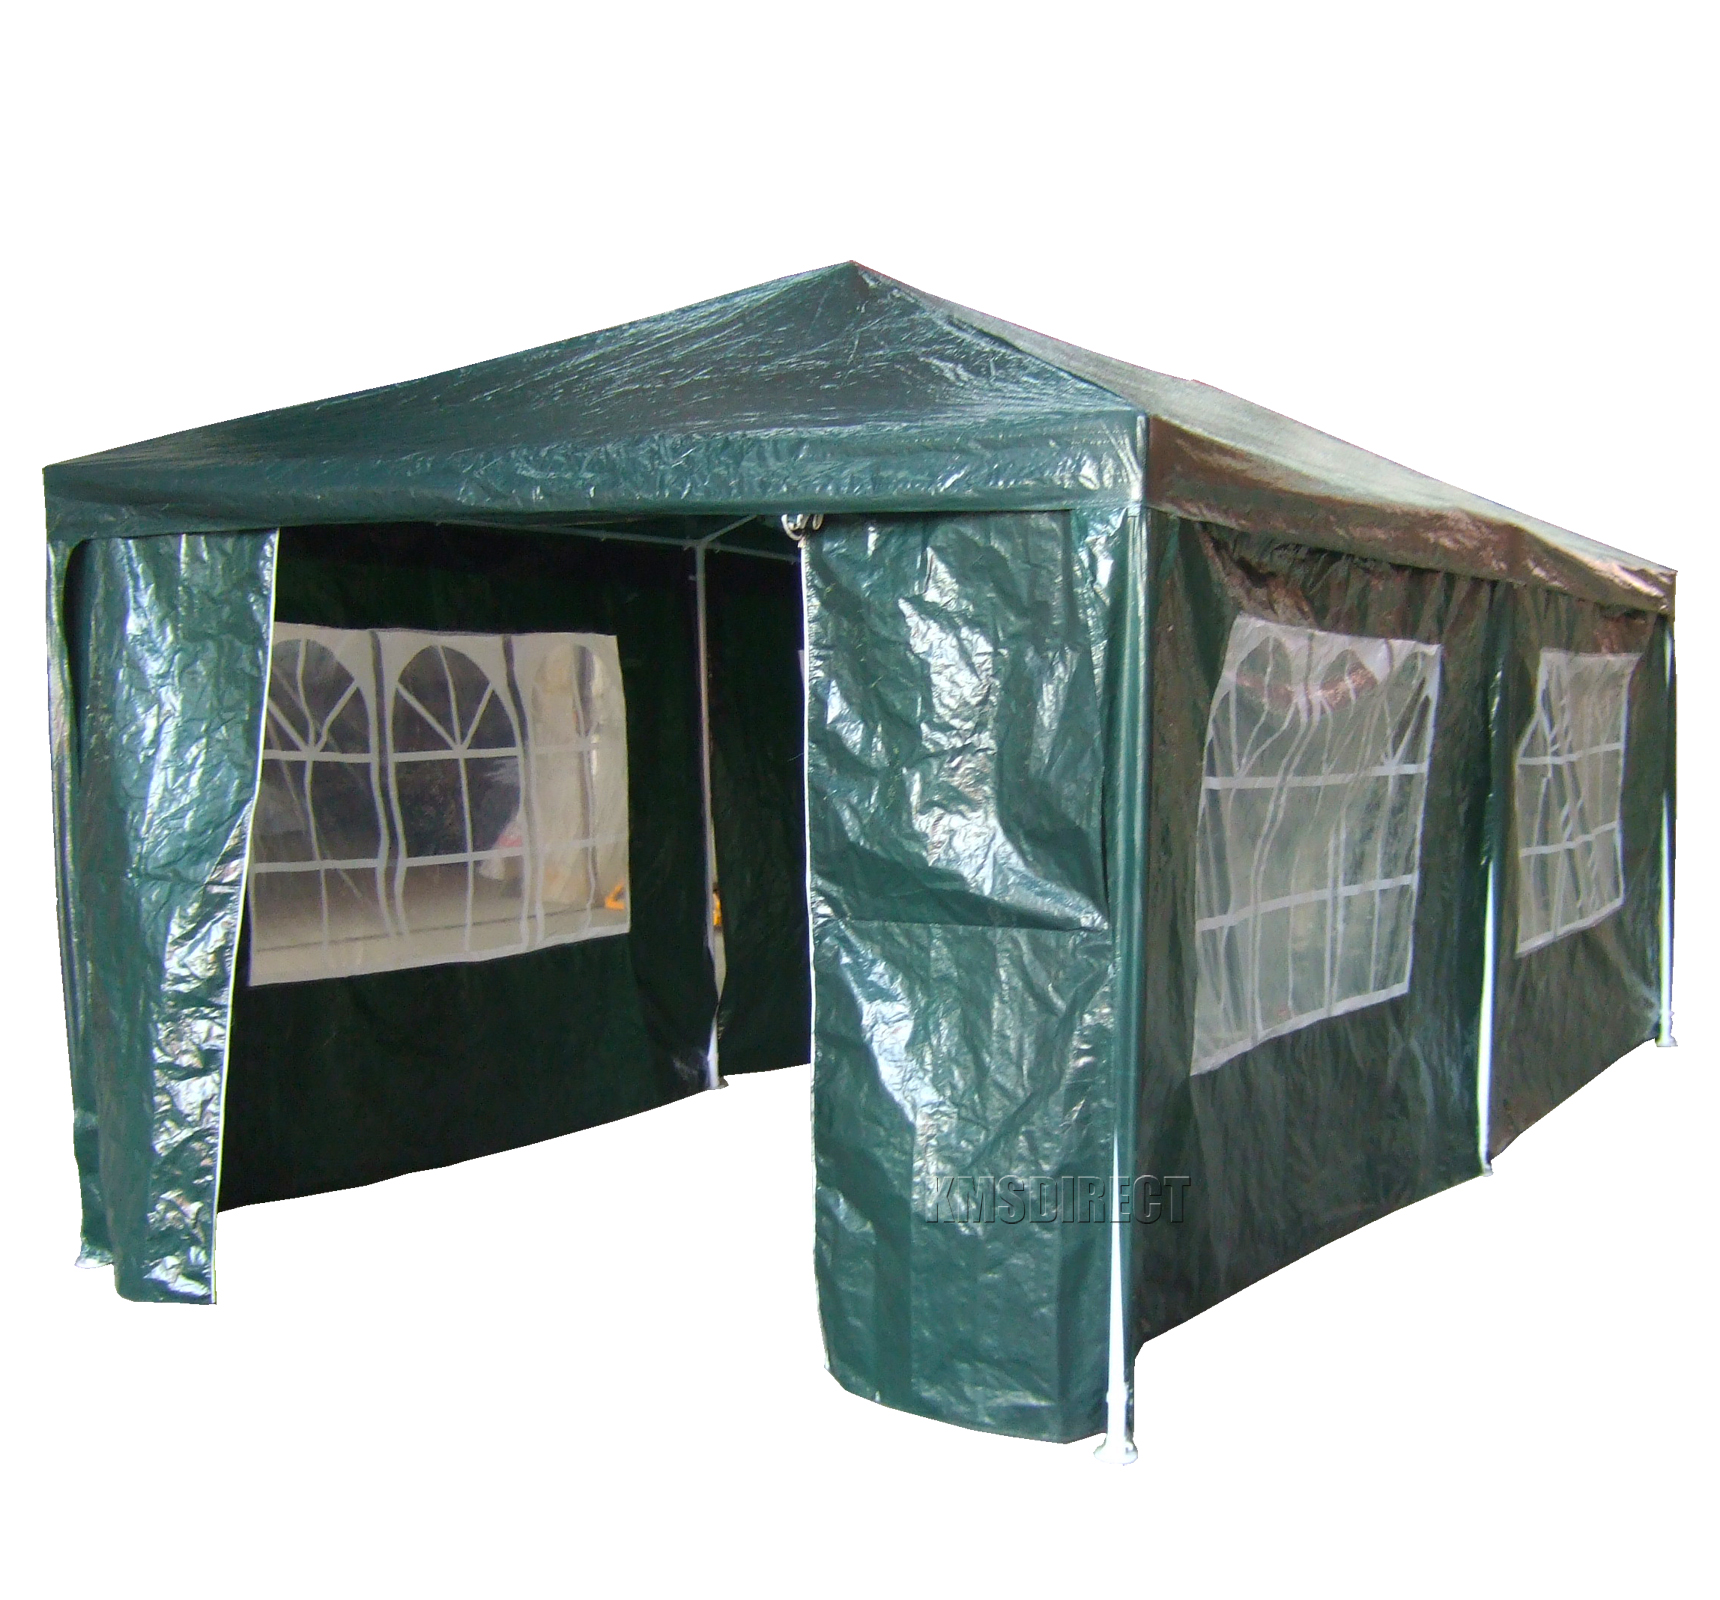 garten pavillon 3m x 6m gr n 120g wasserdicht pe marquee baldachin party zelt ebay. Black Bedroom Furniture Sets. Home Design Ideas